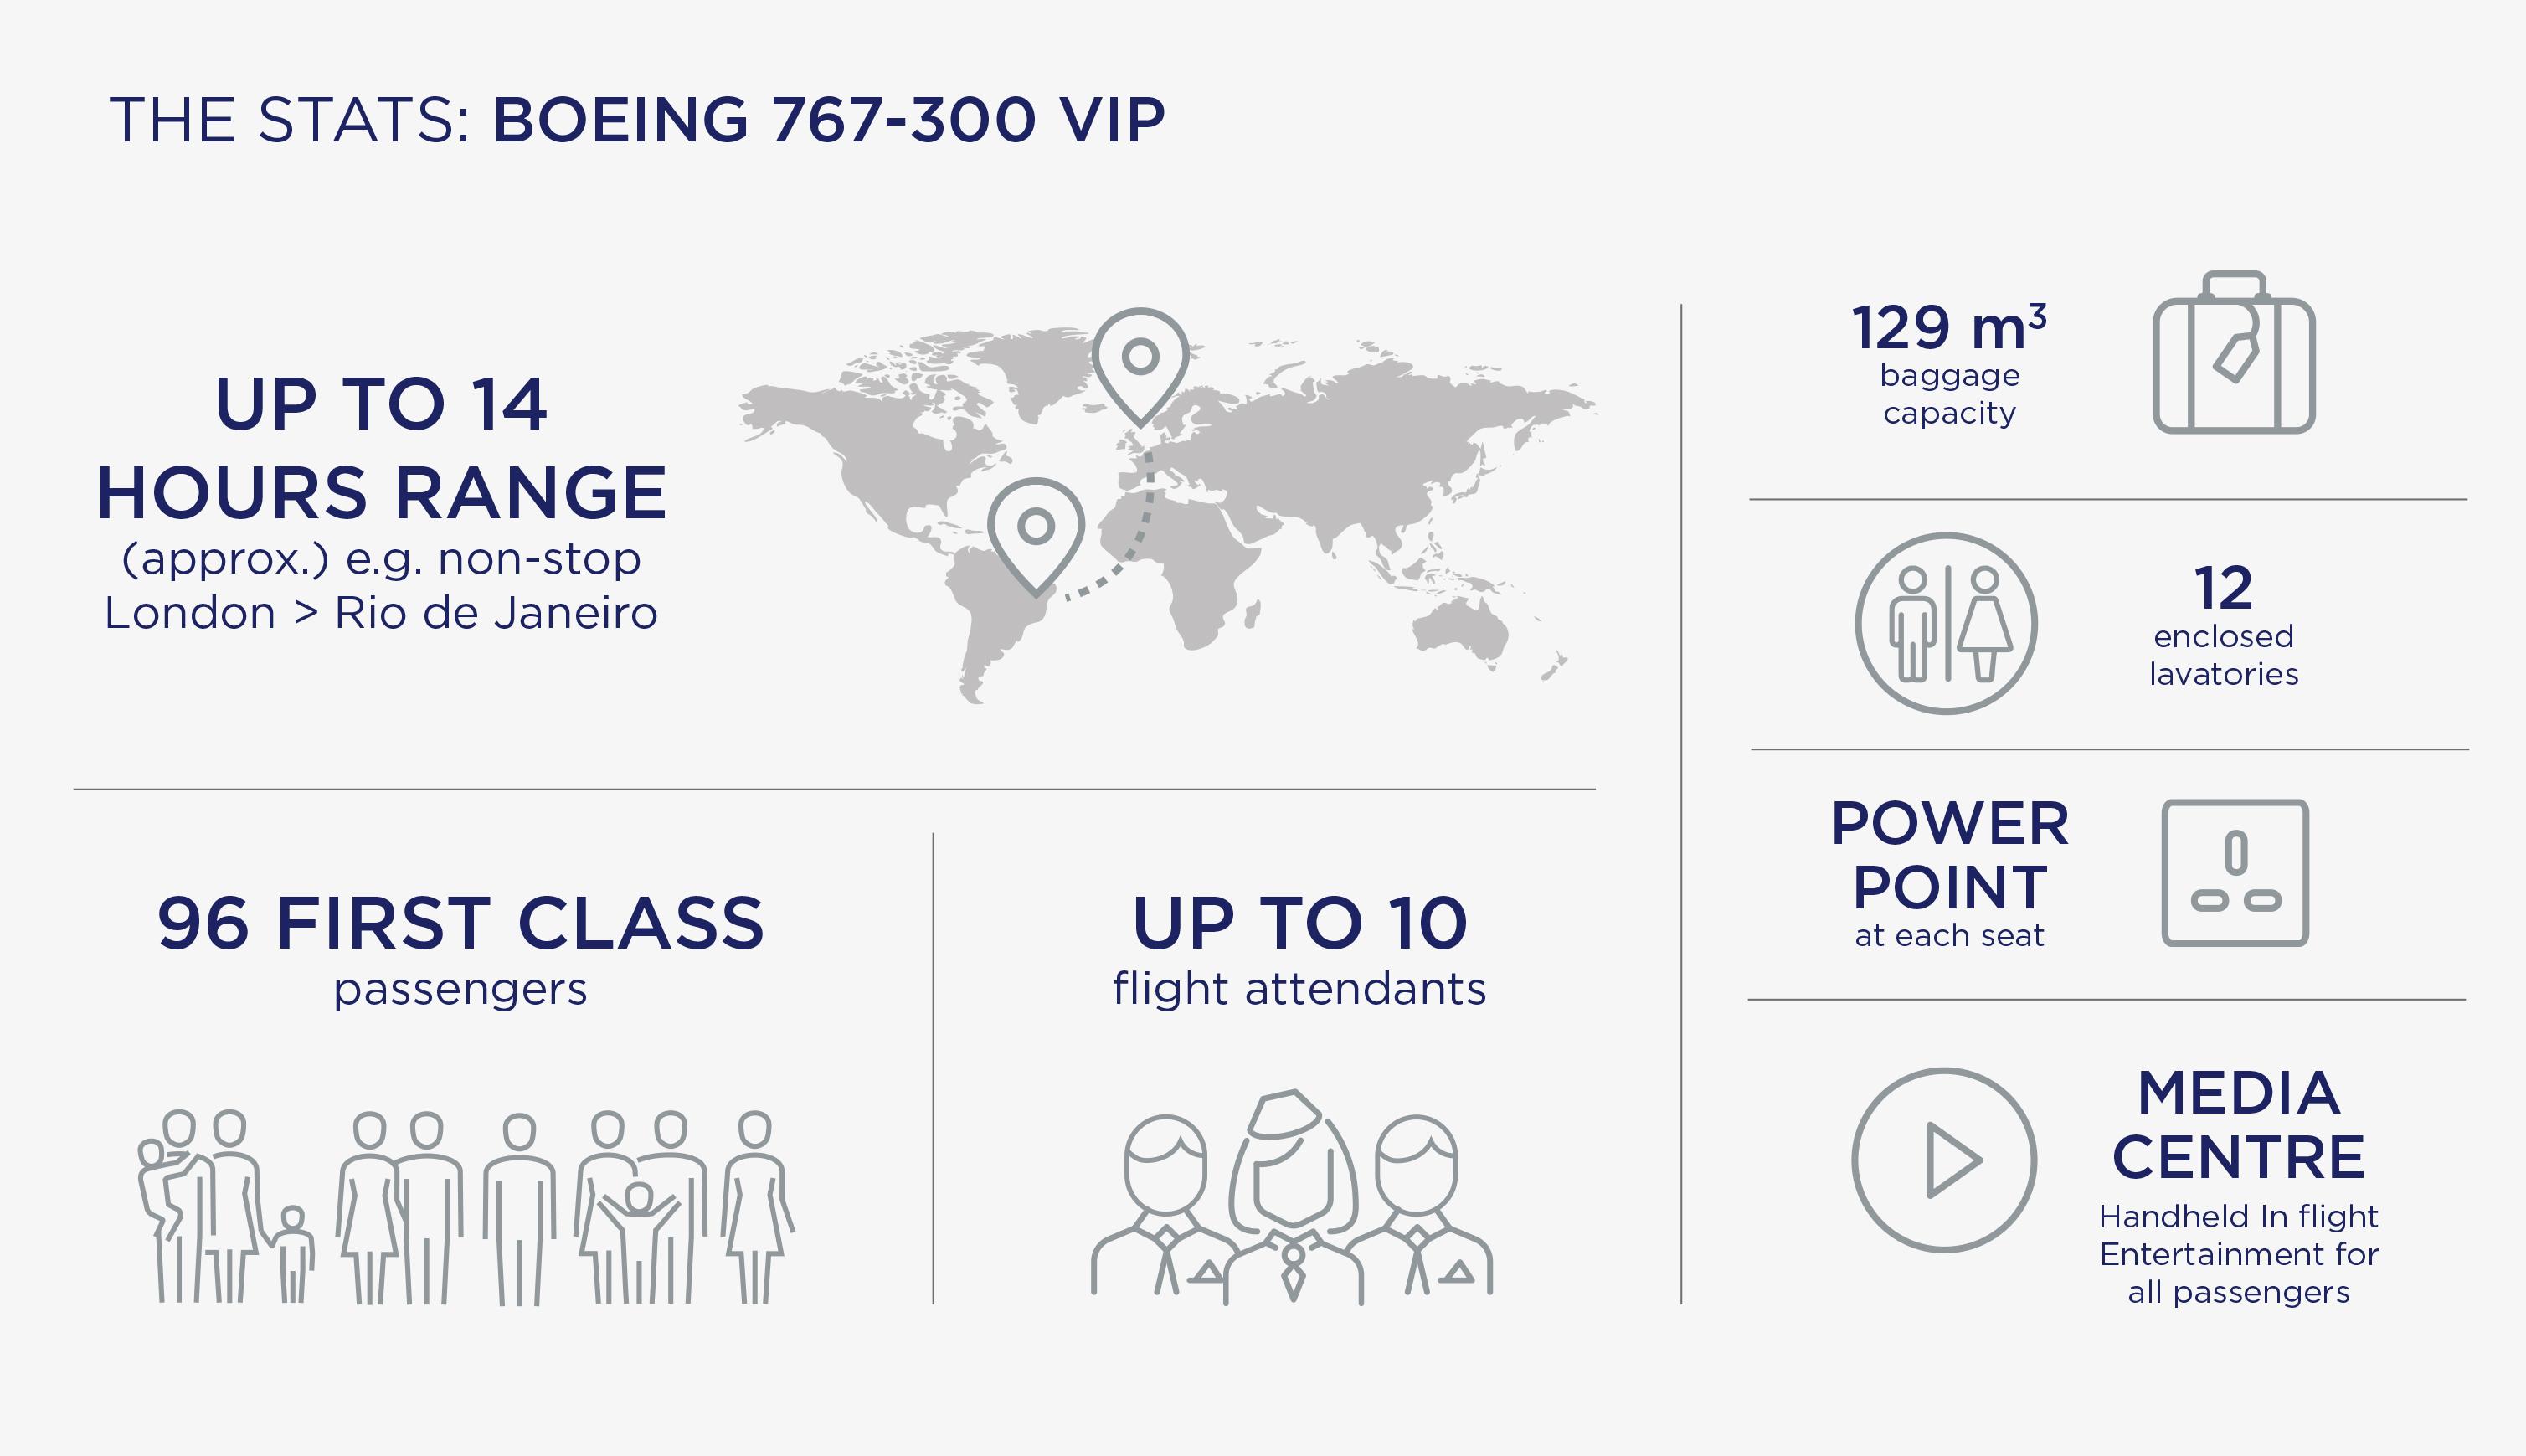 VIP Boeing 767-300 Graphic